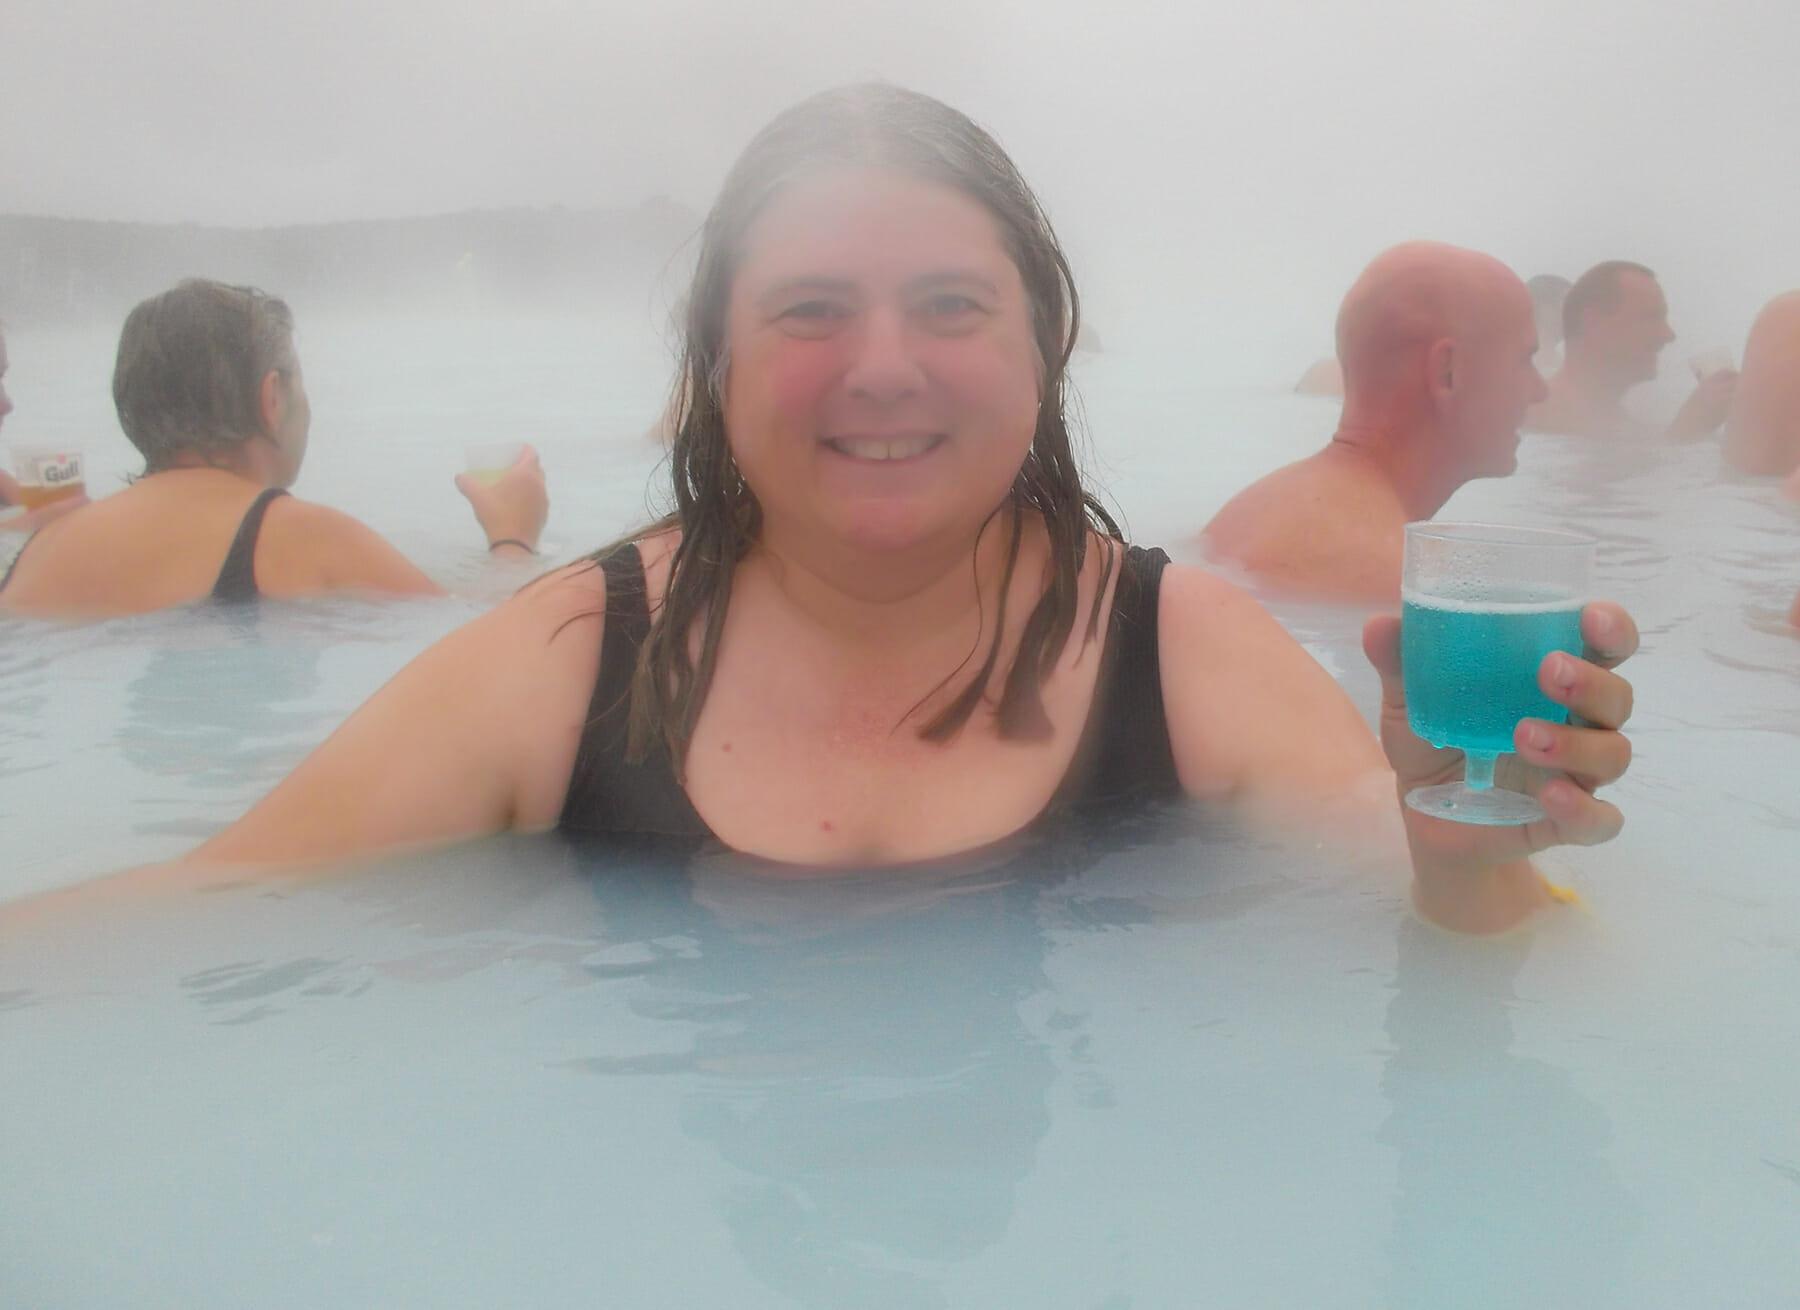 Soaking in Iceland's Blue Lagoon